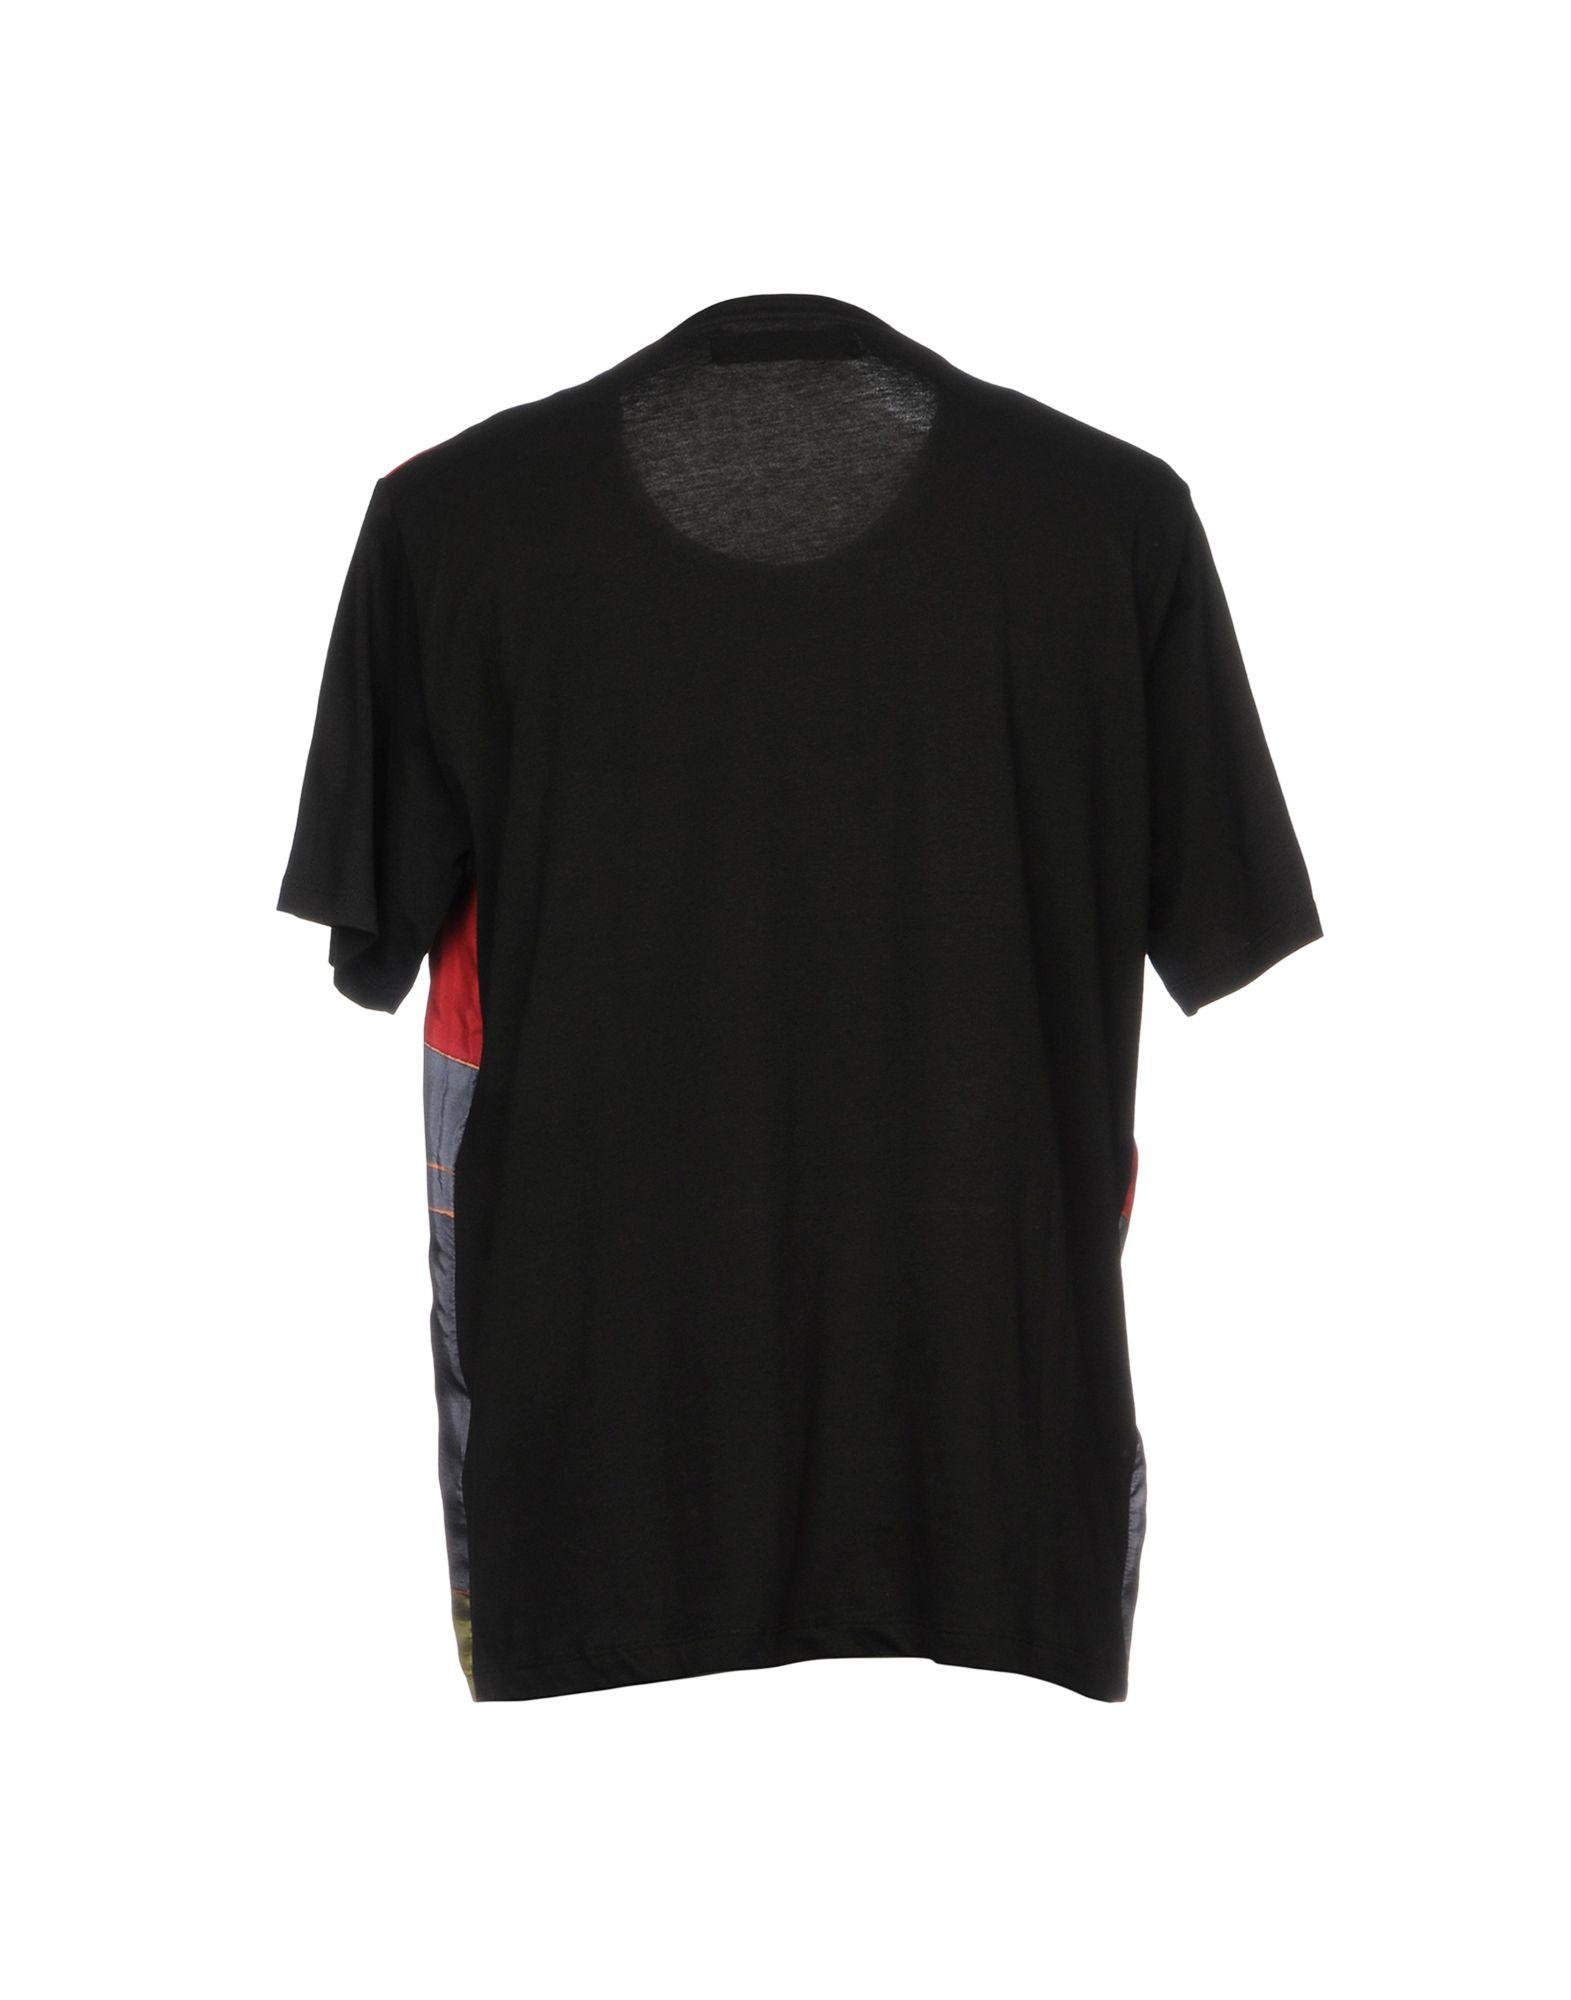 T-Shirt Christian Pellizzari Uomo 12086759GR - 12086759GR Uomo 079db4